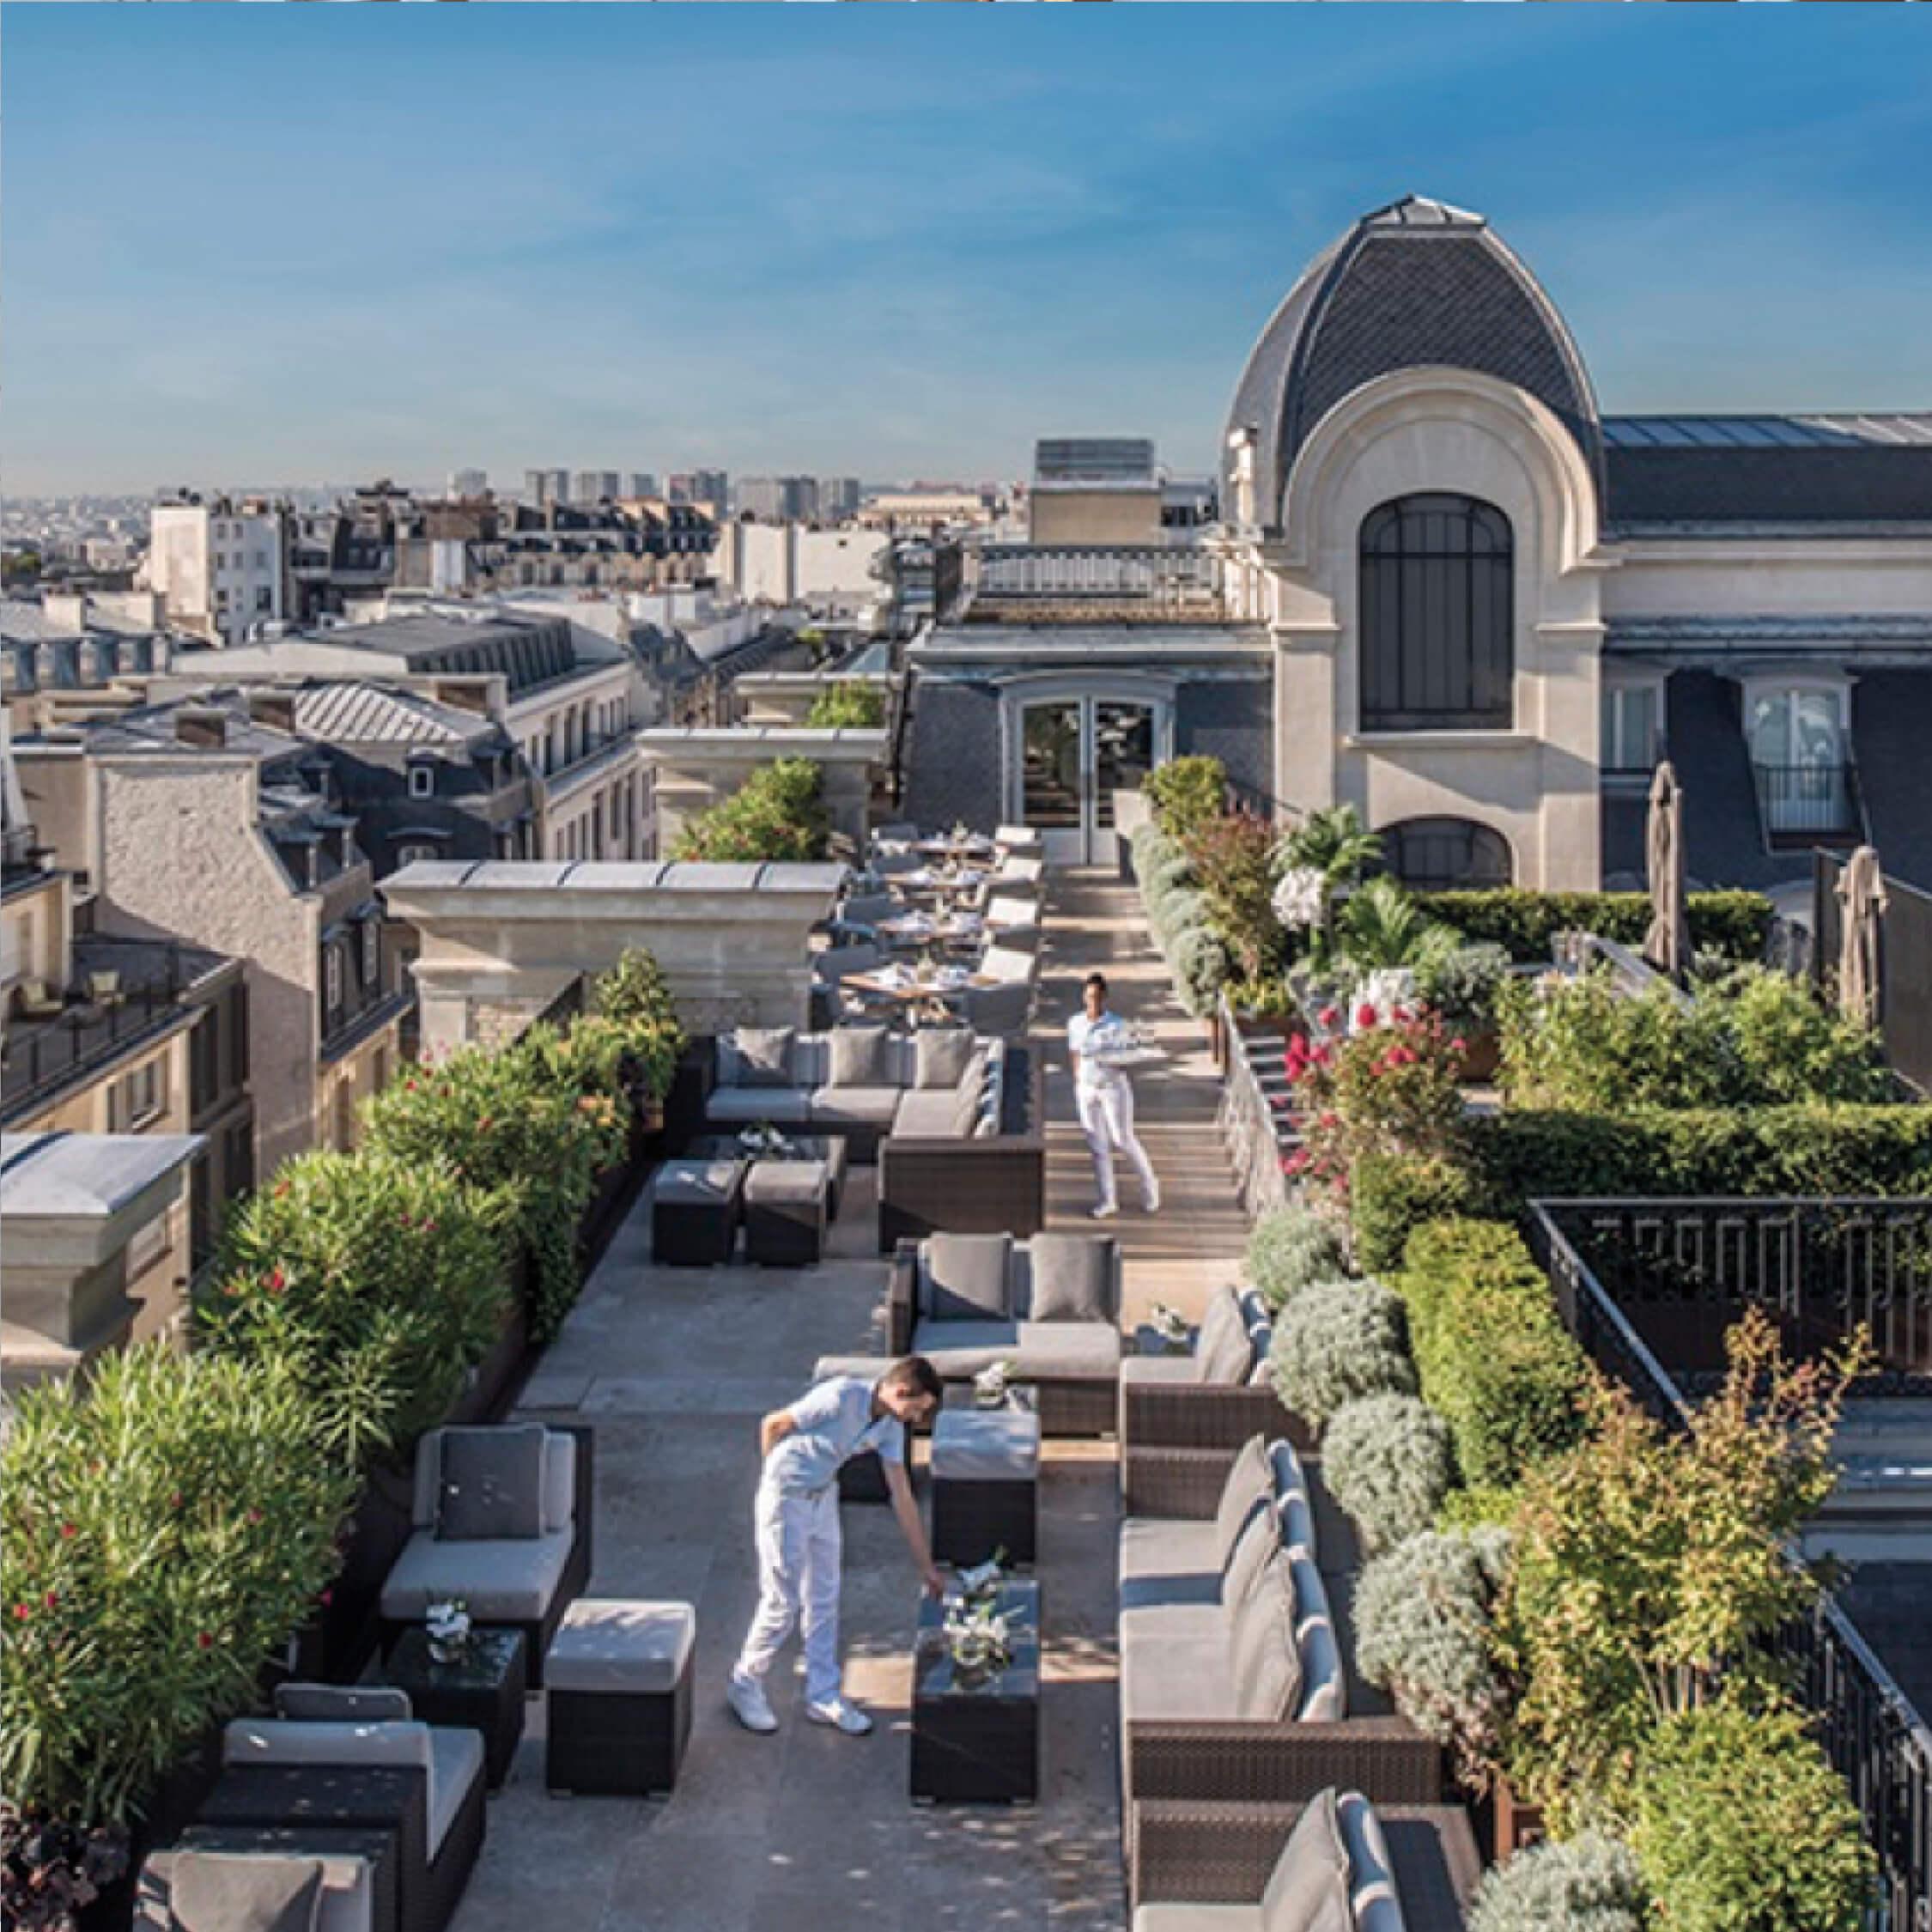 Our Top 5 Parisian Hotels